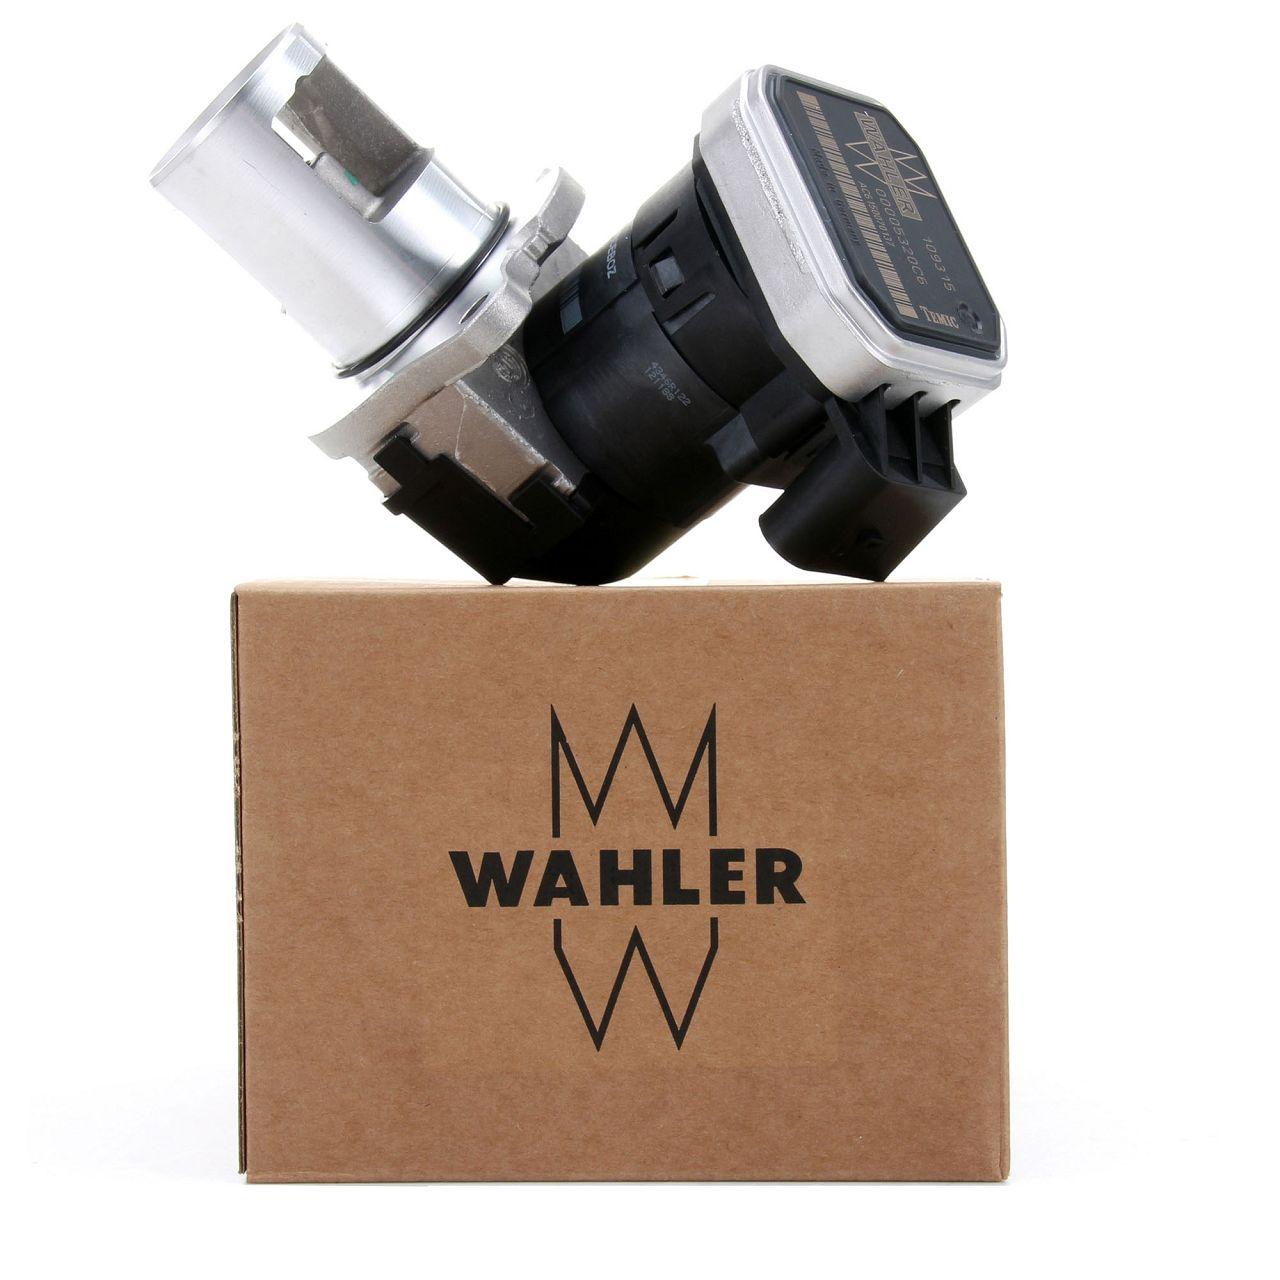 WAHLER AGR Ventil 7389D für Mercedes-Benz W203 W211 200/220 CDI 6461400760